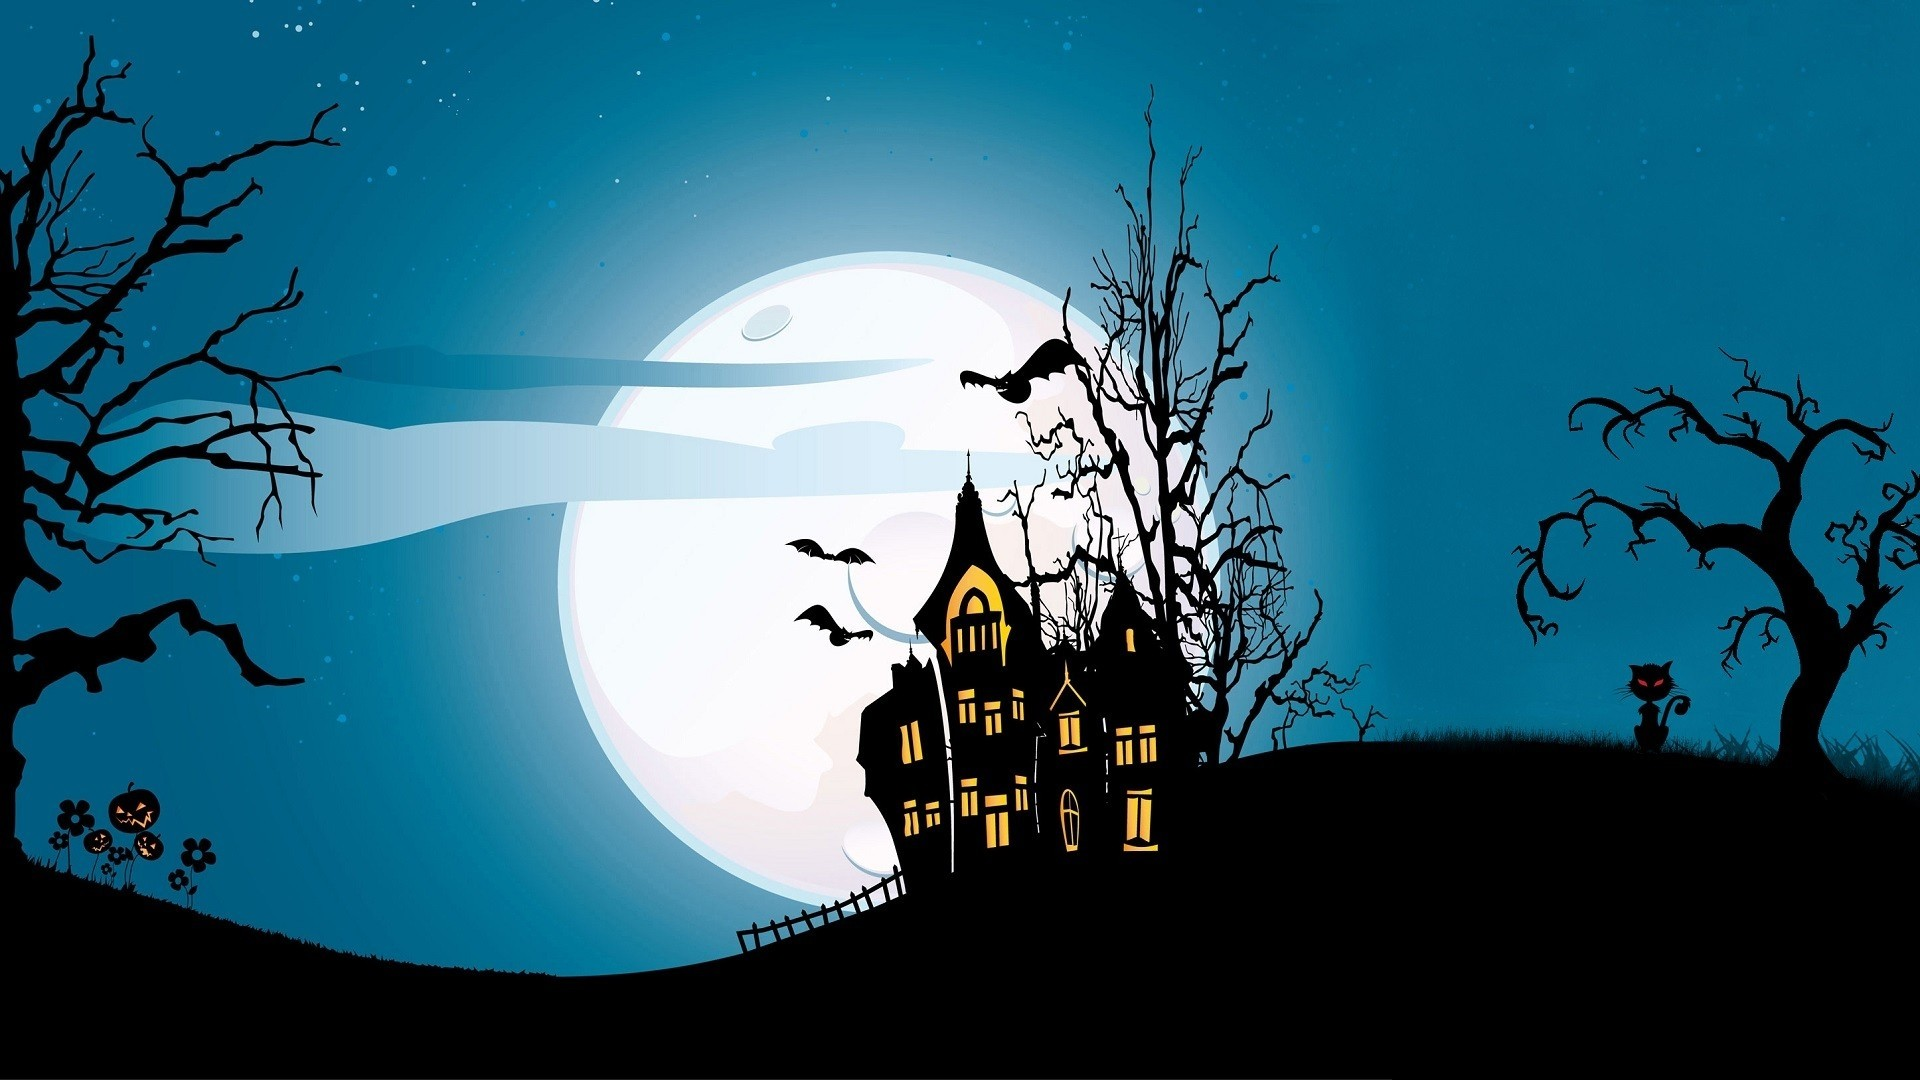 Spooky Vector wallpaper photo hd